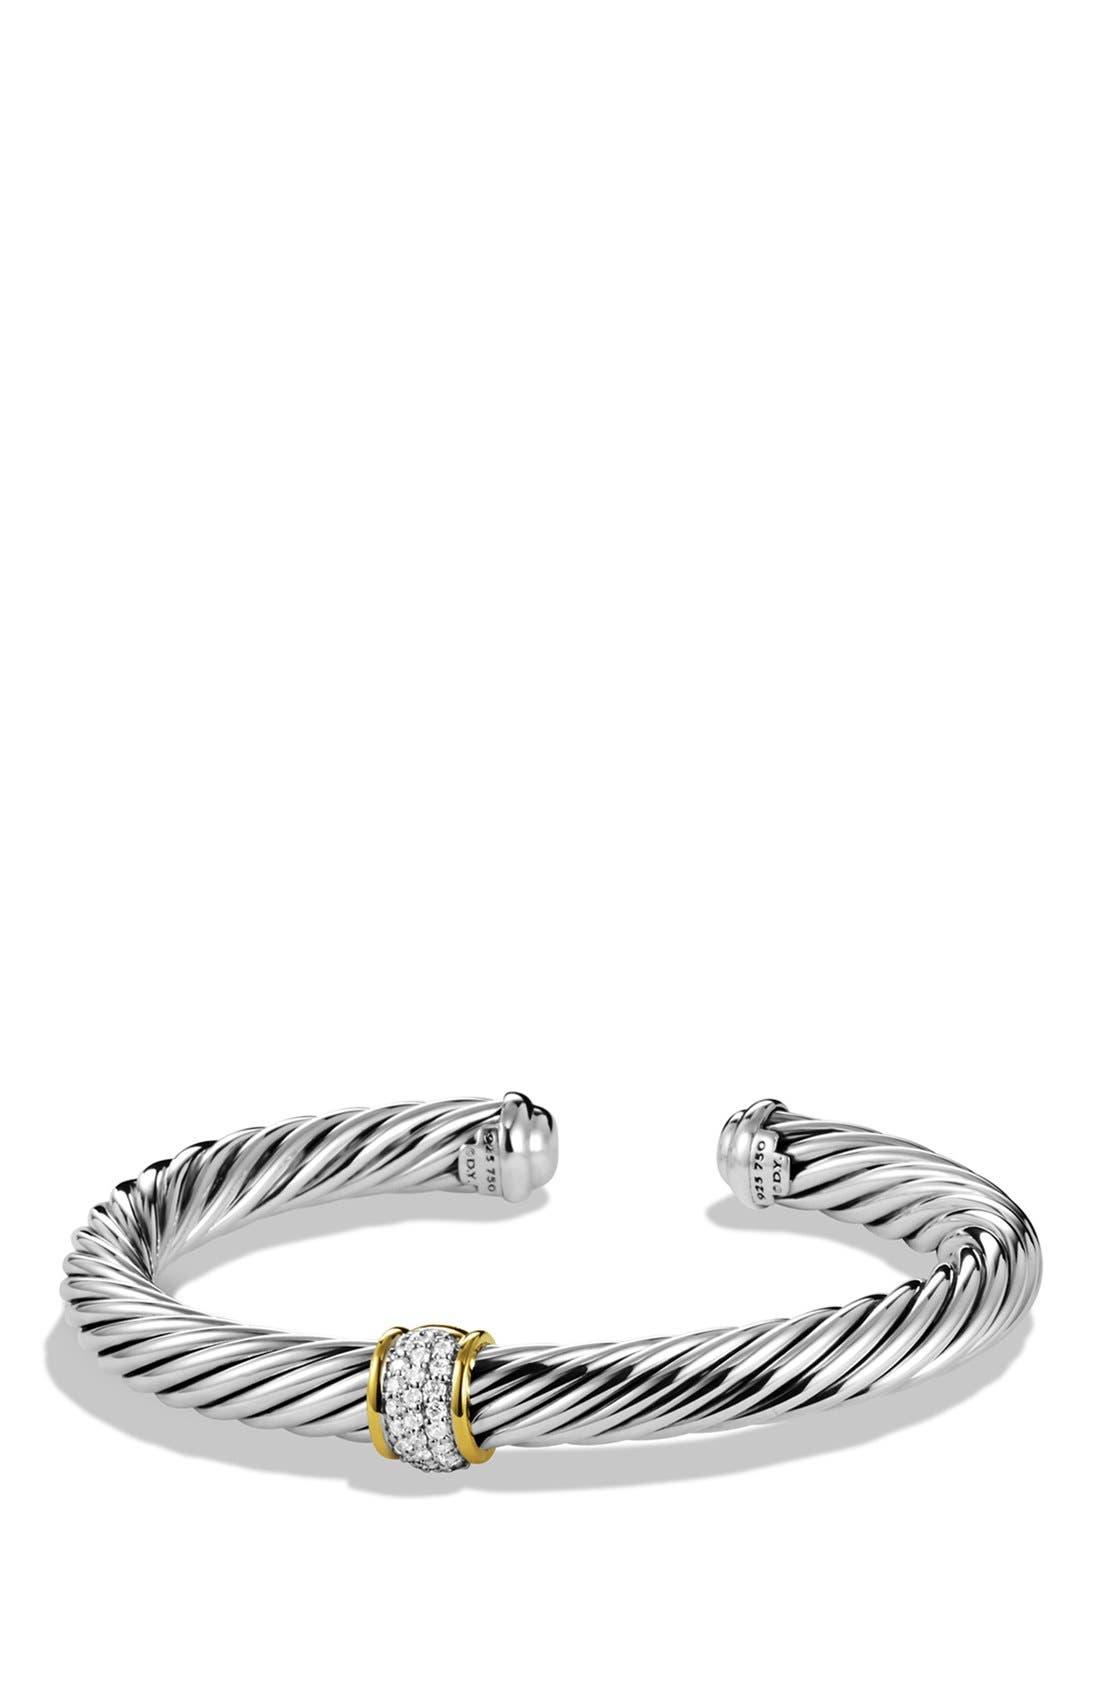 Cable Classics Bracelet with Diamonds & 18K Gold, 7mm,                             Main thumbnail 1, color,                             Diamond